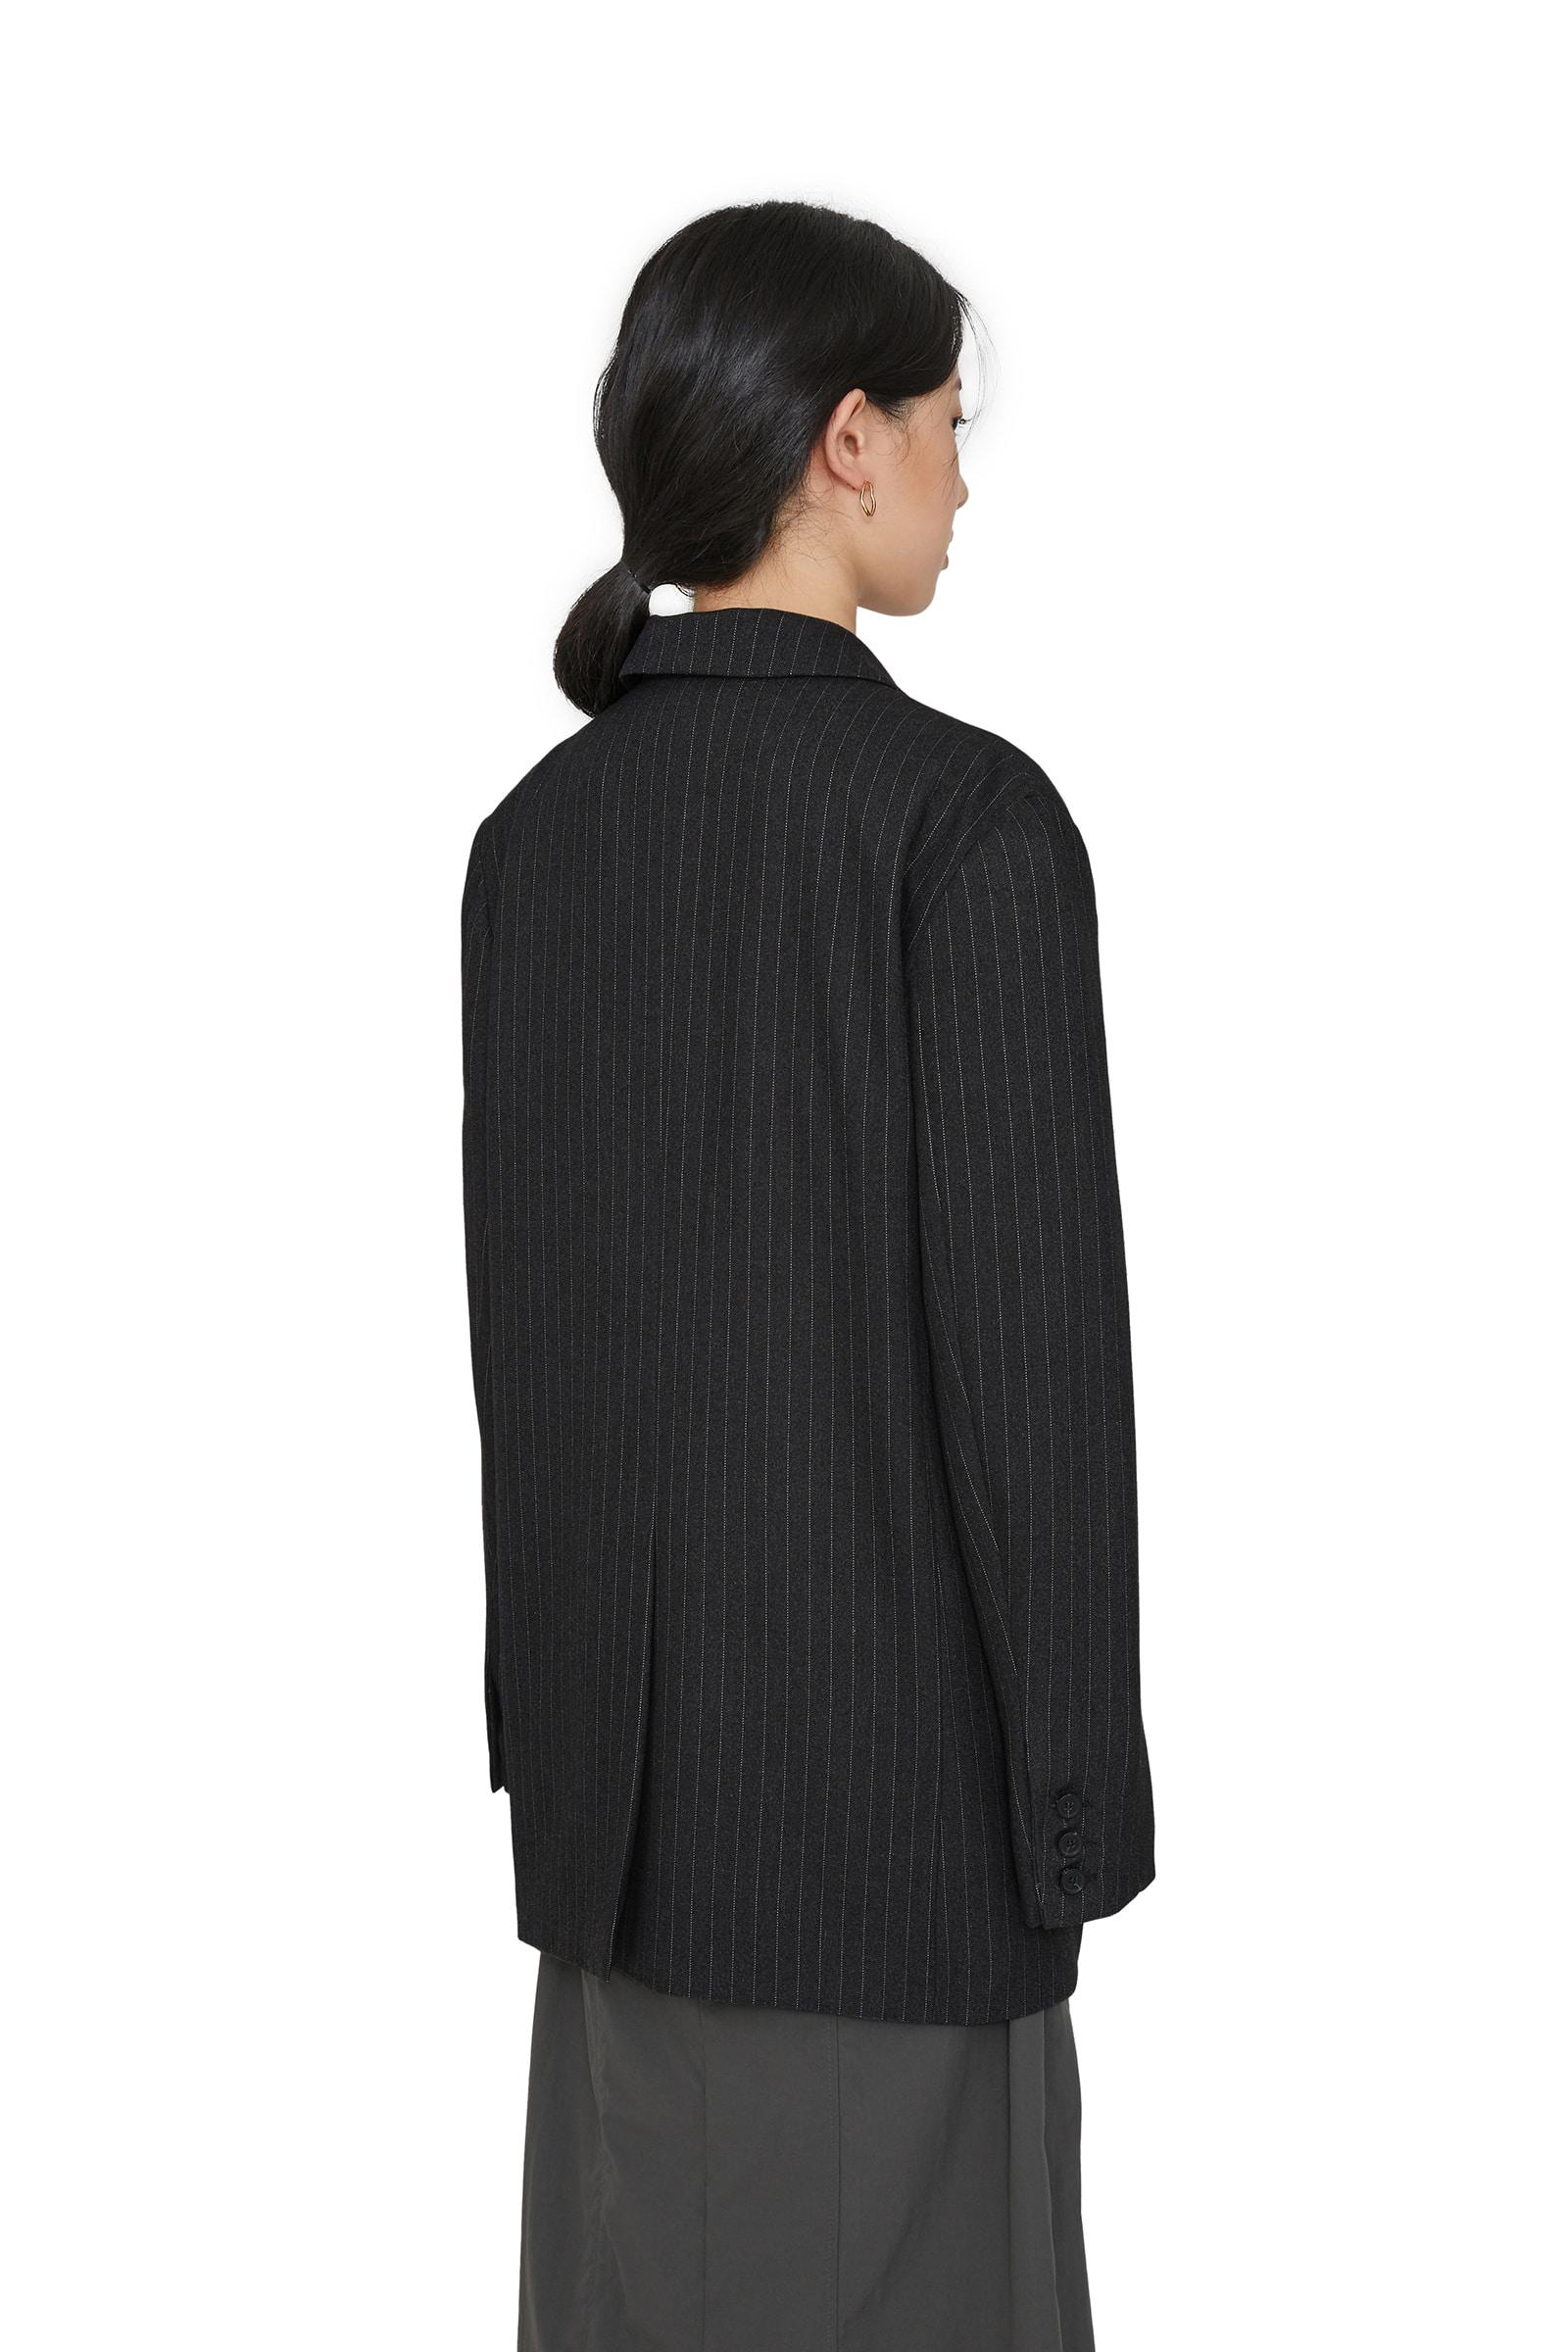 Men's striped pattern blazer